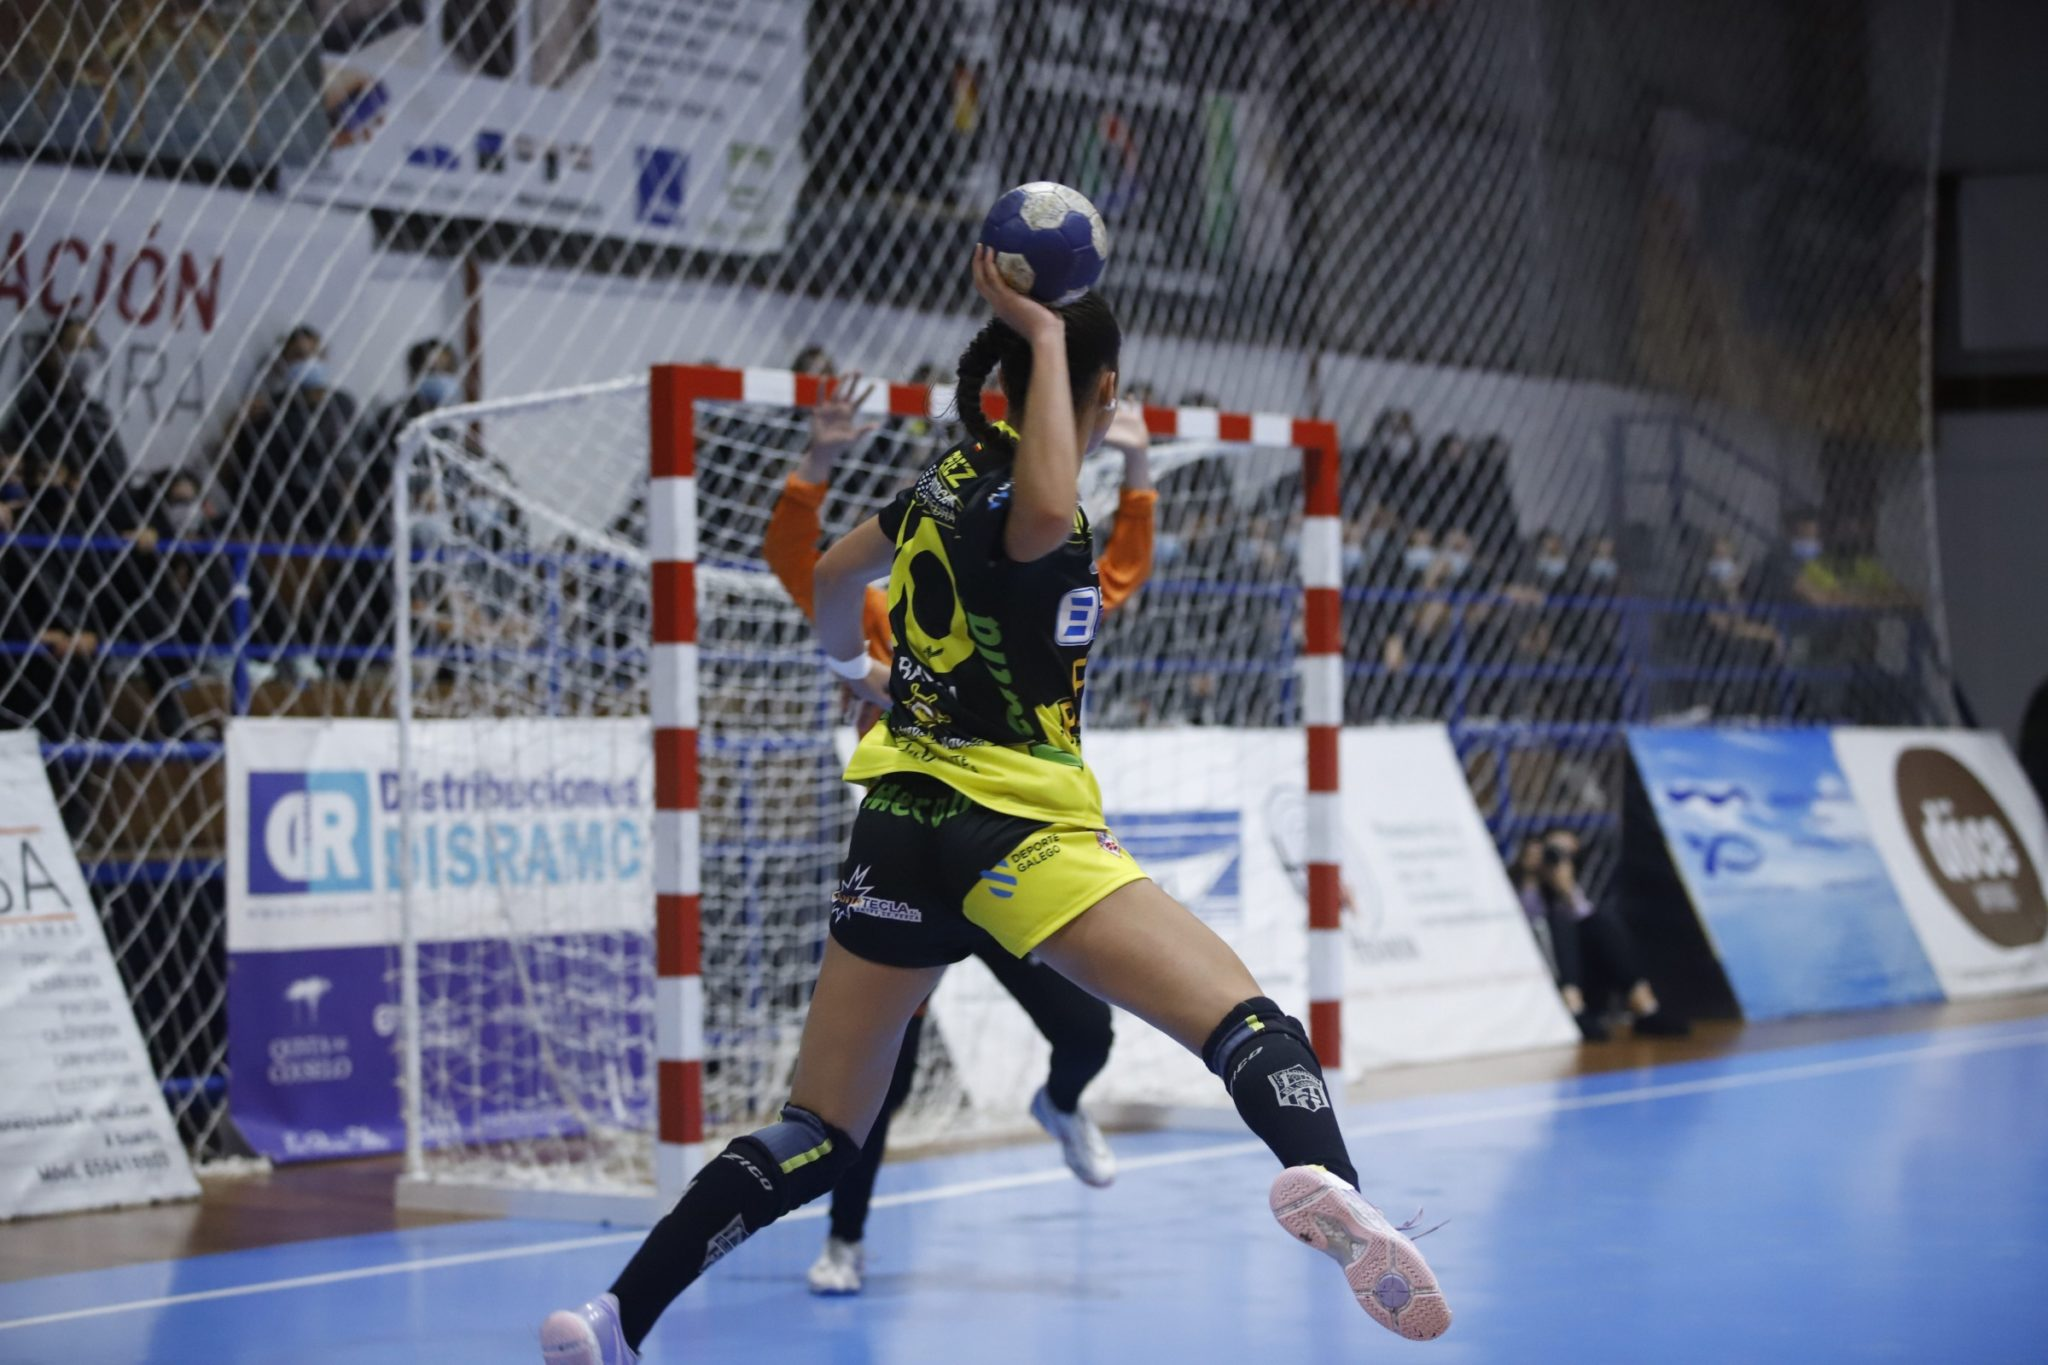 Guardés vs Granollers / Sportcoeco